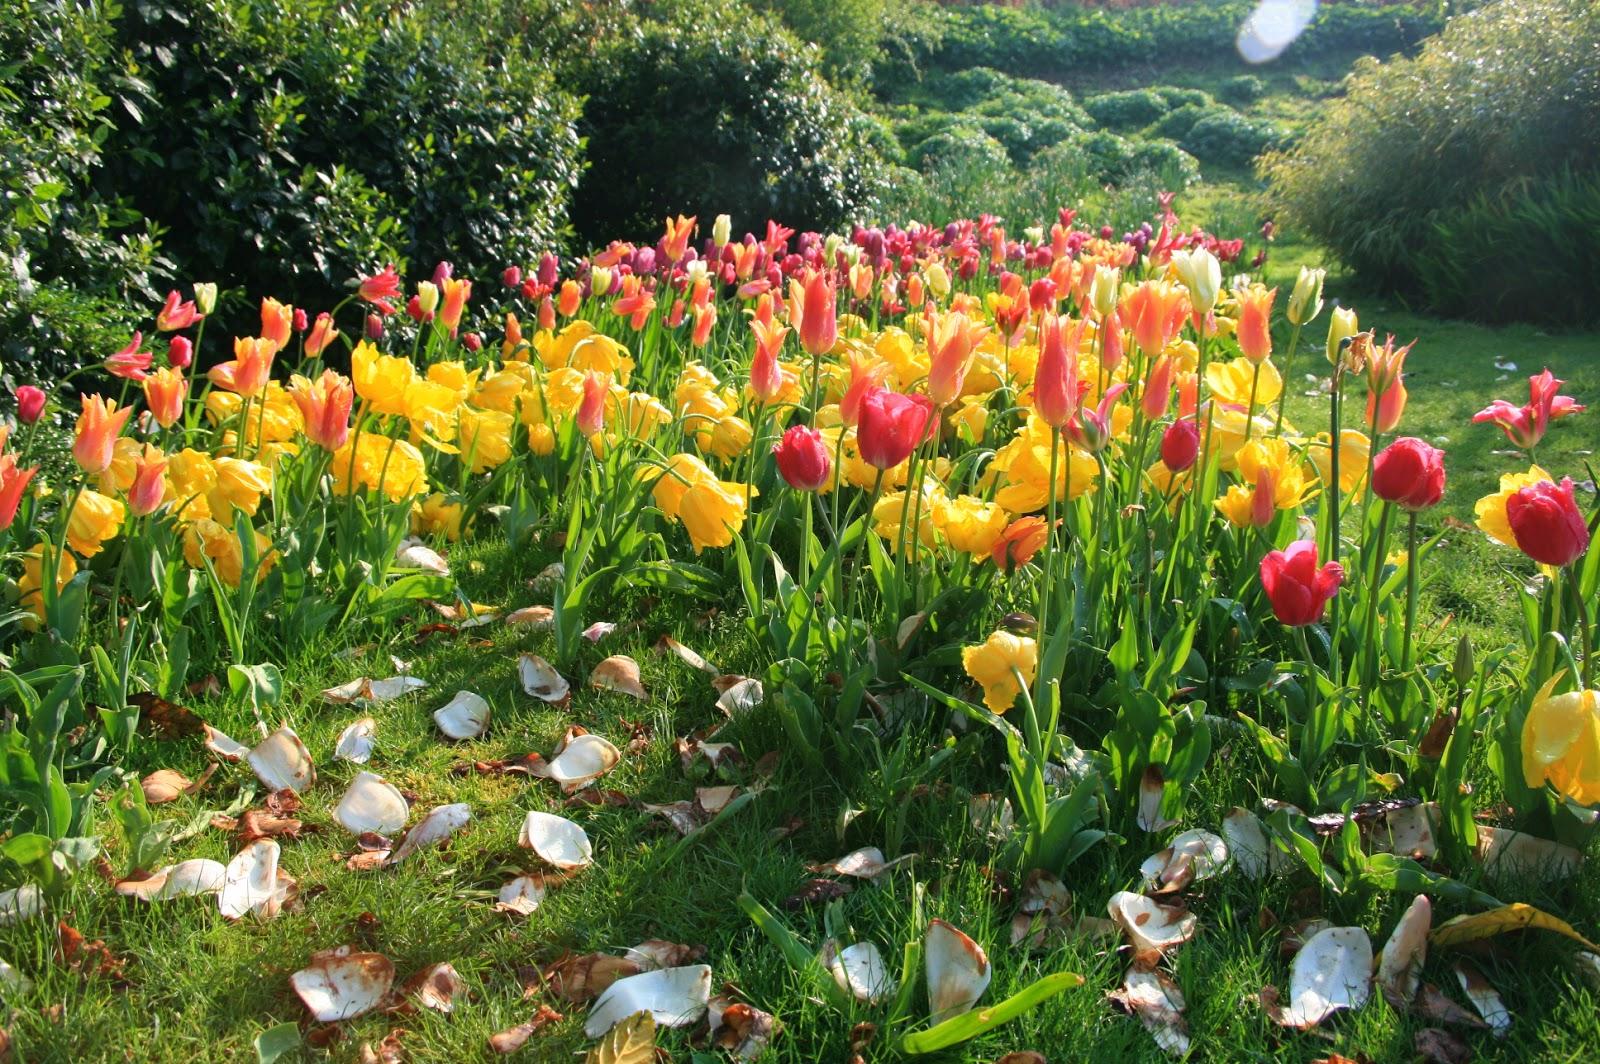 http://graindesab.blogspot.fr/2015/02/en-fleurs.html